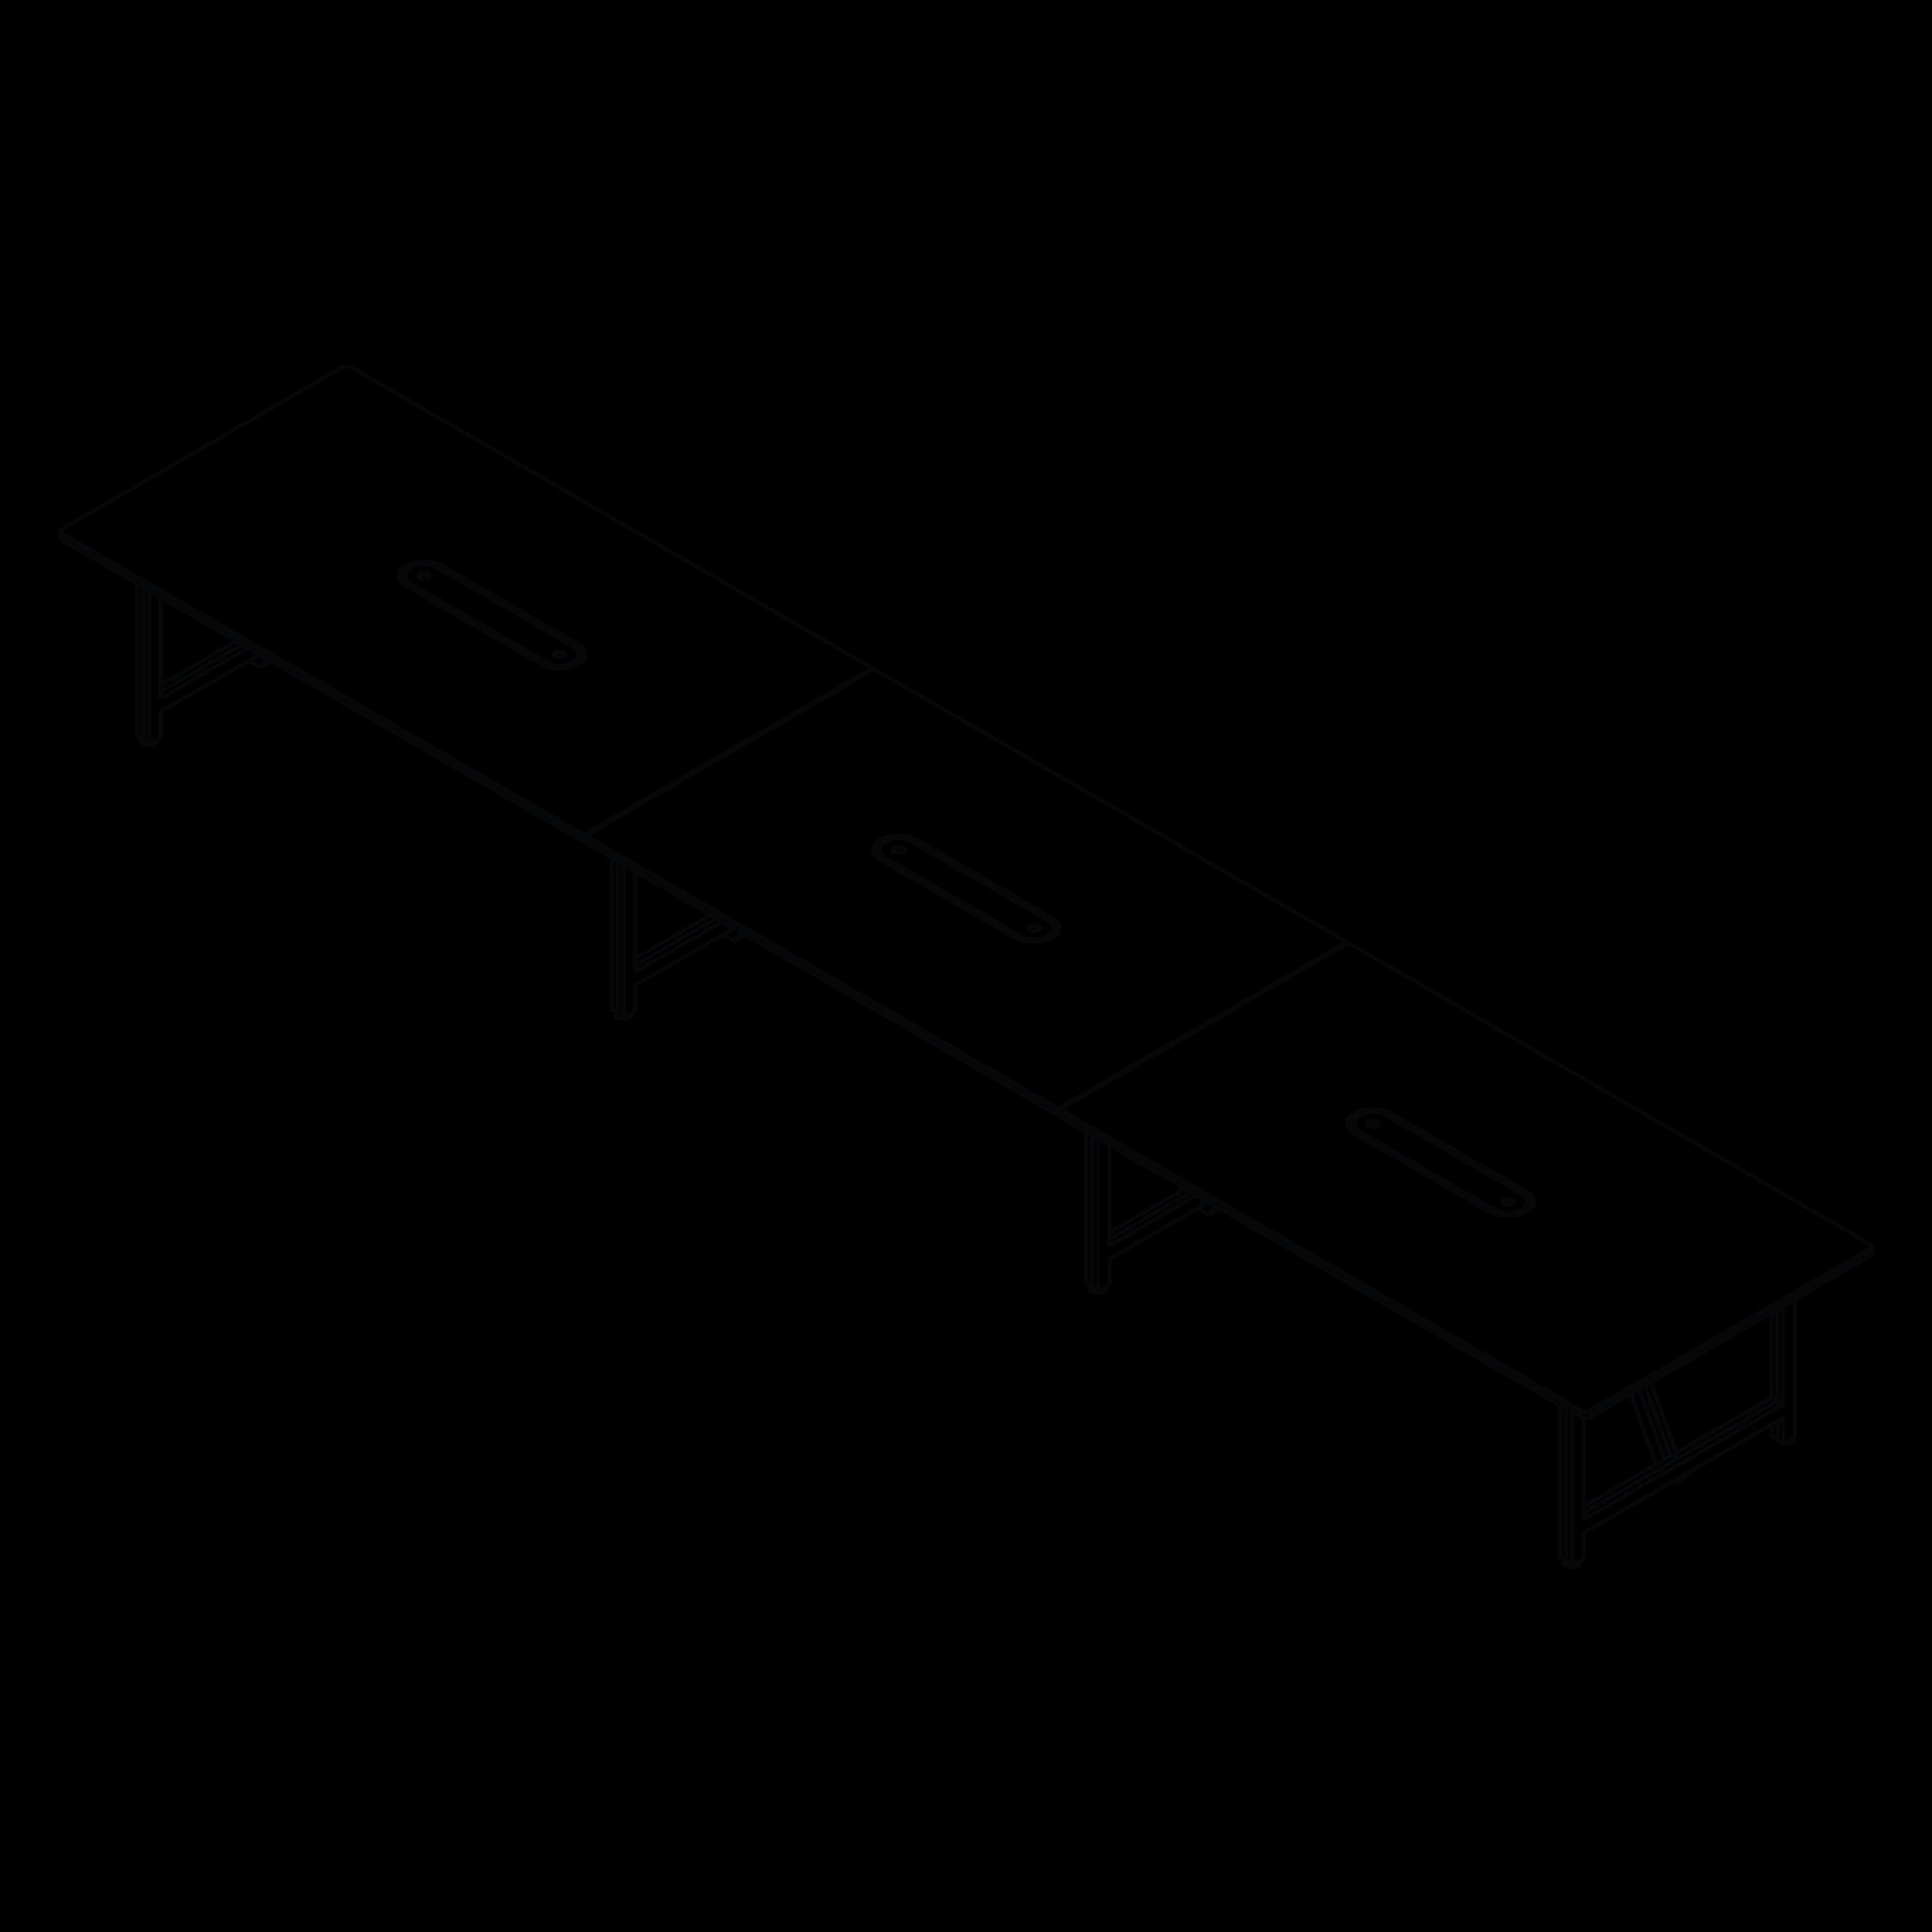 SoWatt-Plywood-Desk-Rover-Team-Table-Large.png